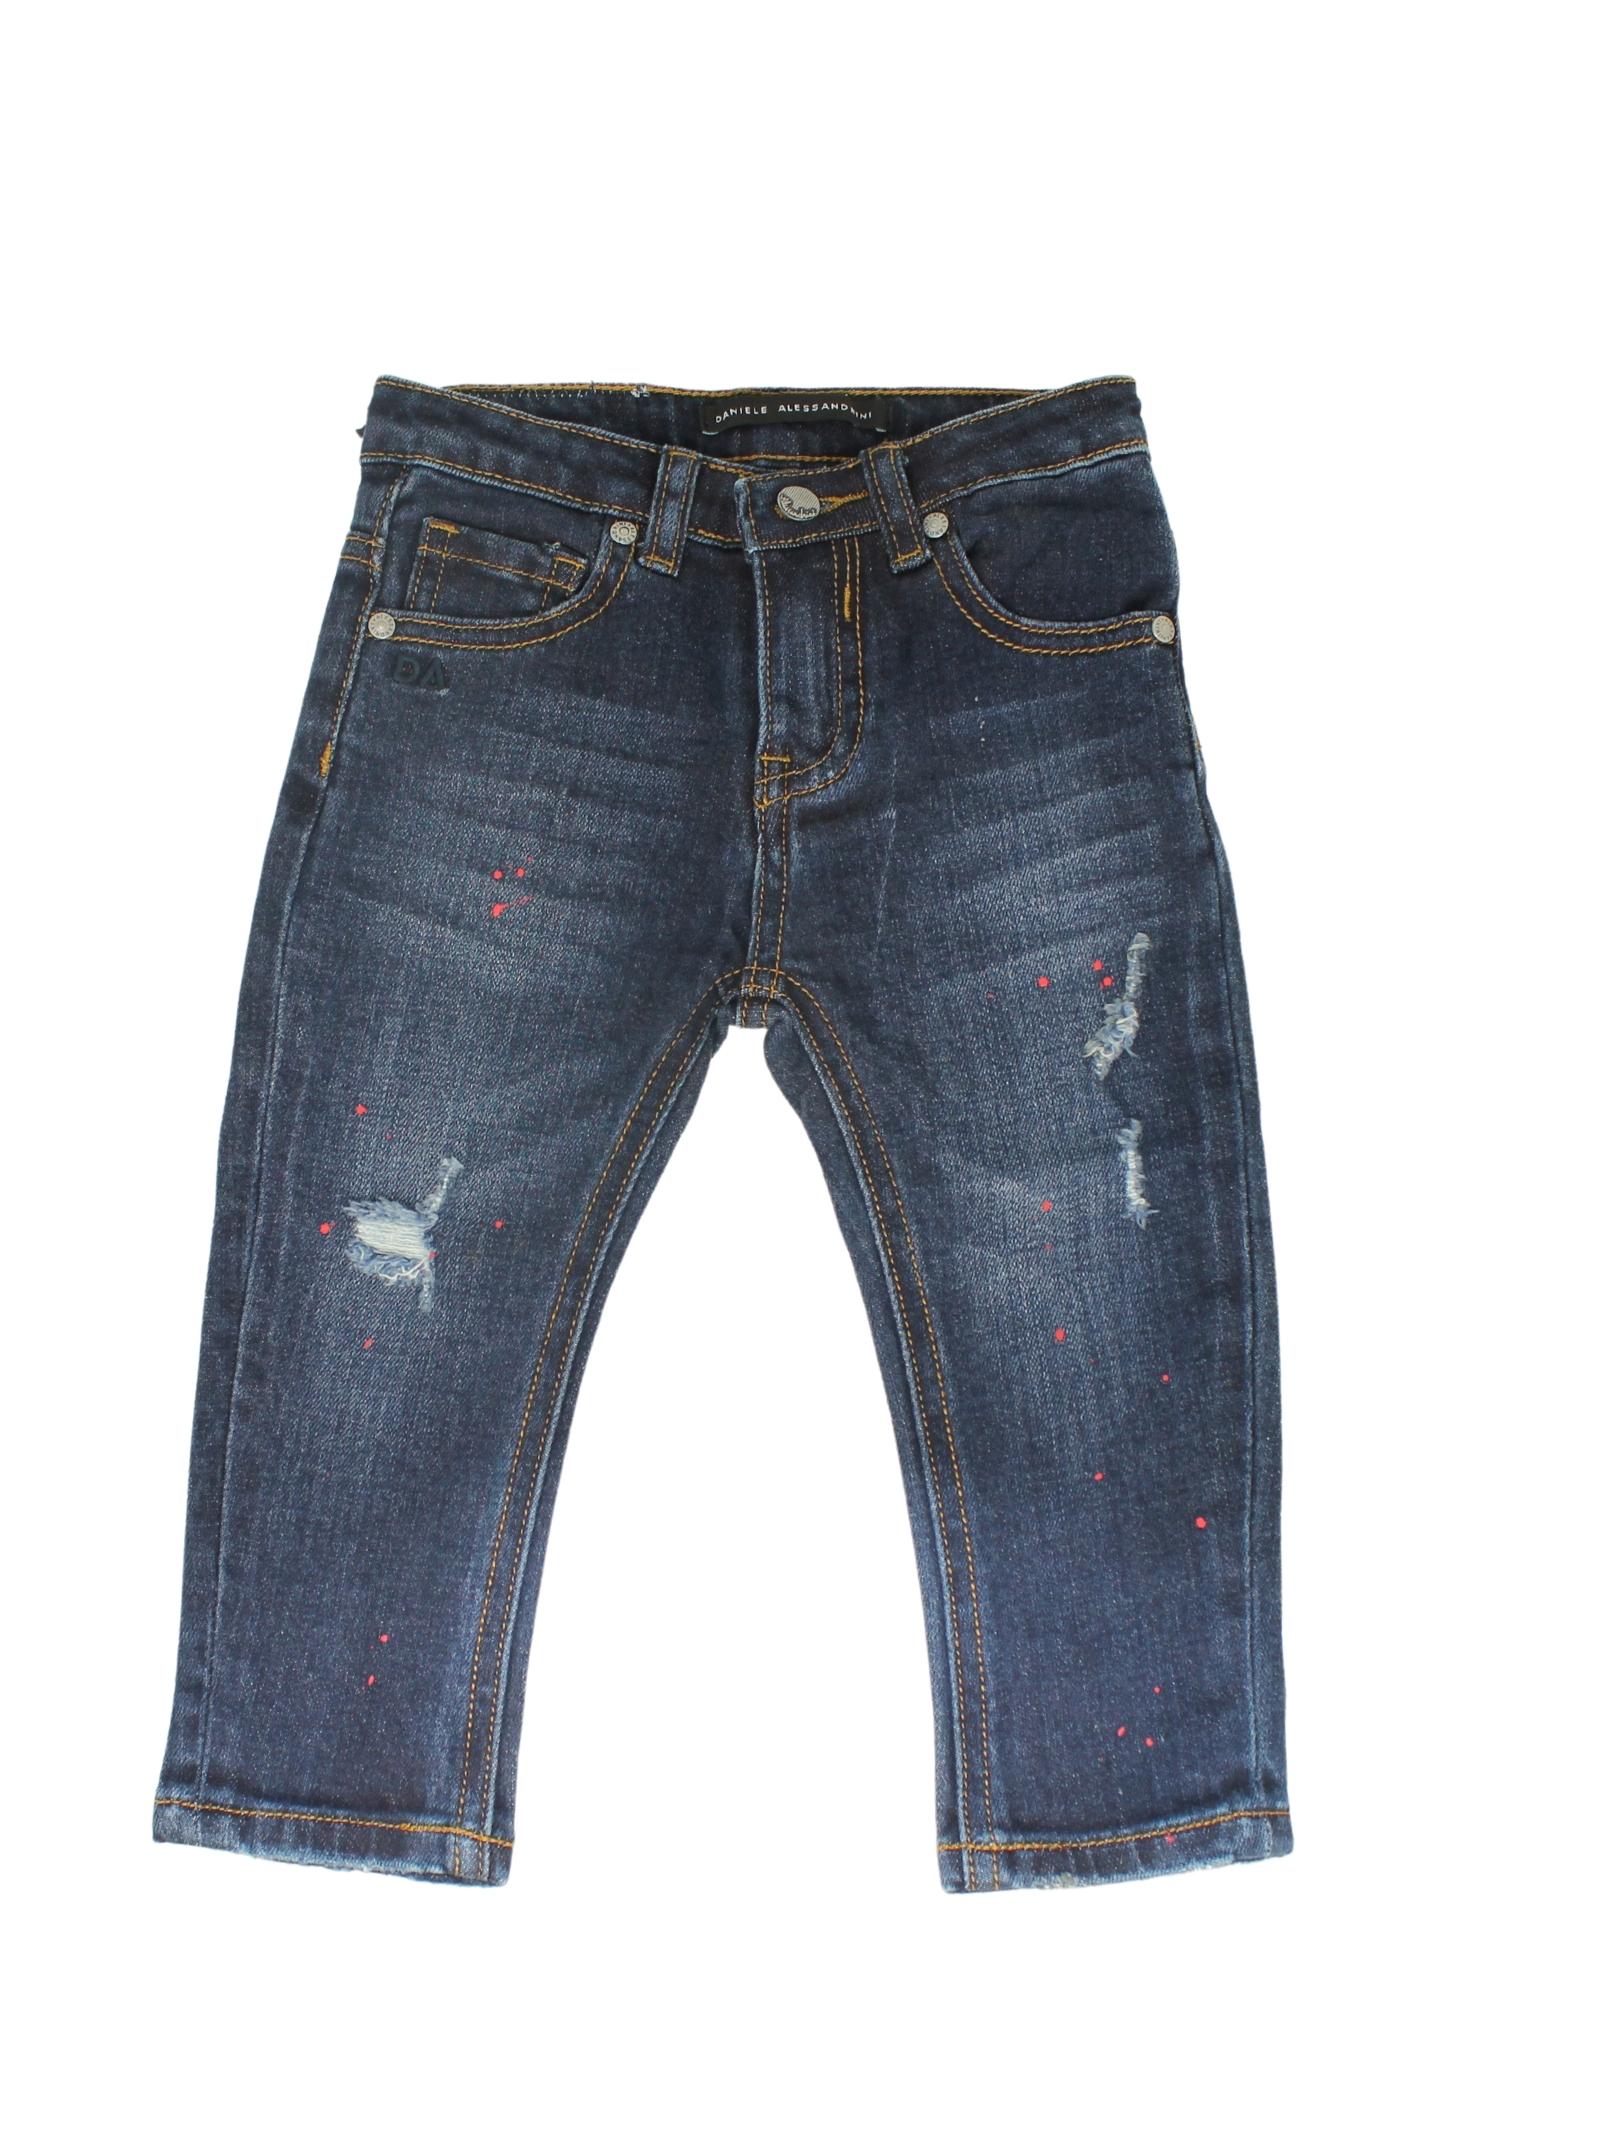 Blue-Red Jeans Boy DANIELE ALESSANDRINI JUNIOR | Trousers | 1291D0755BLU